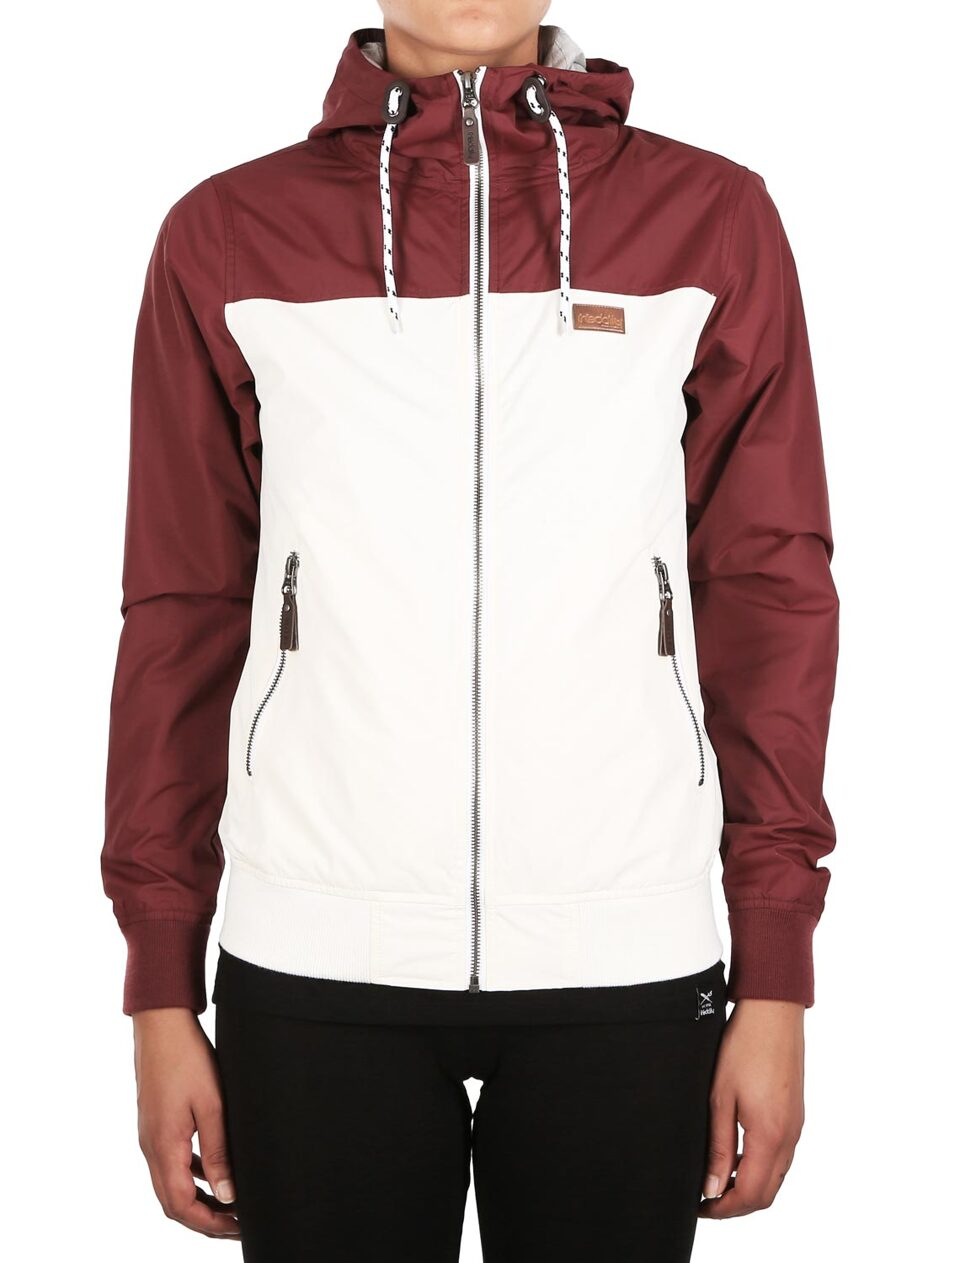 Veruschka Spice Jacket [maroon]   shop official IRIEDAILY